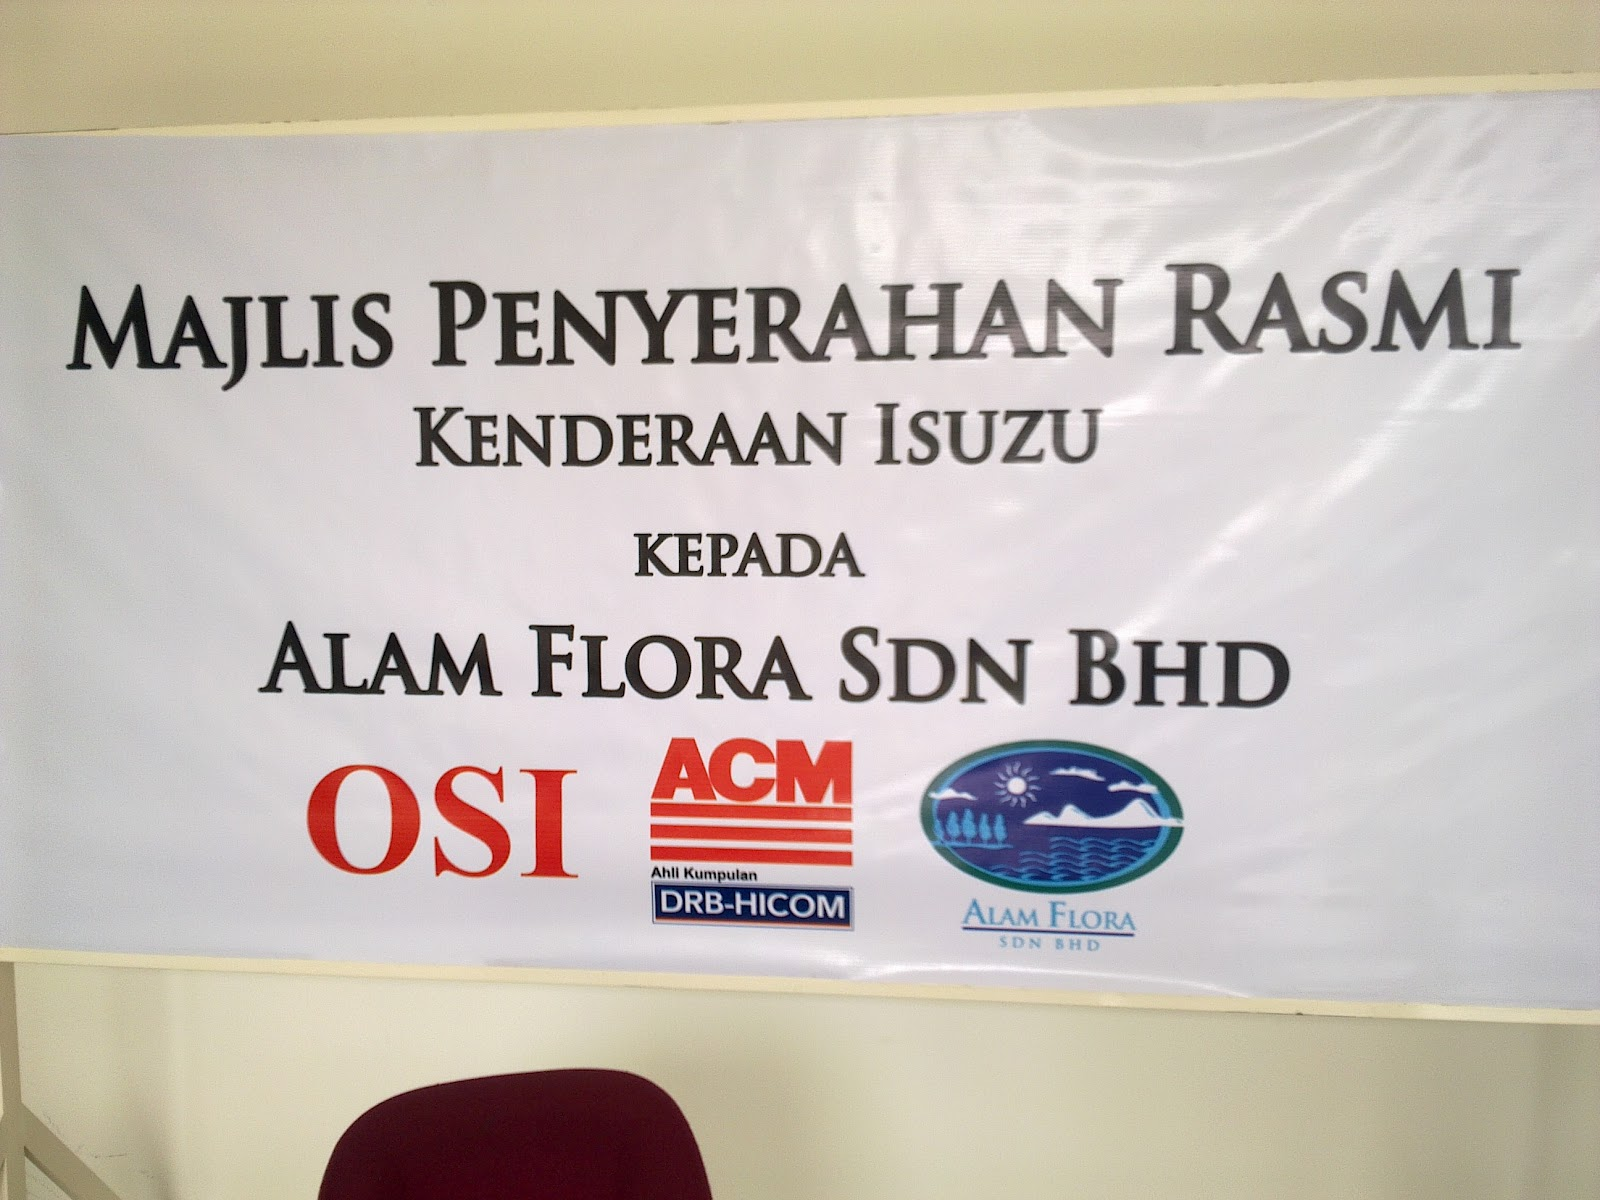 ISUZU TRUCK IN MALAYSIA